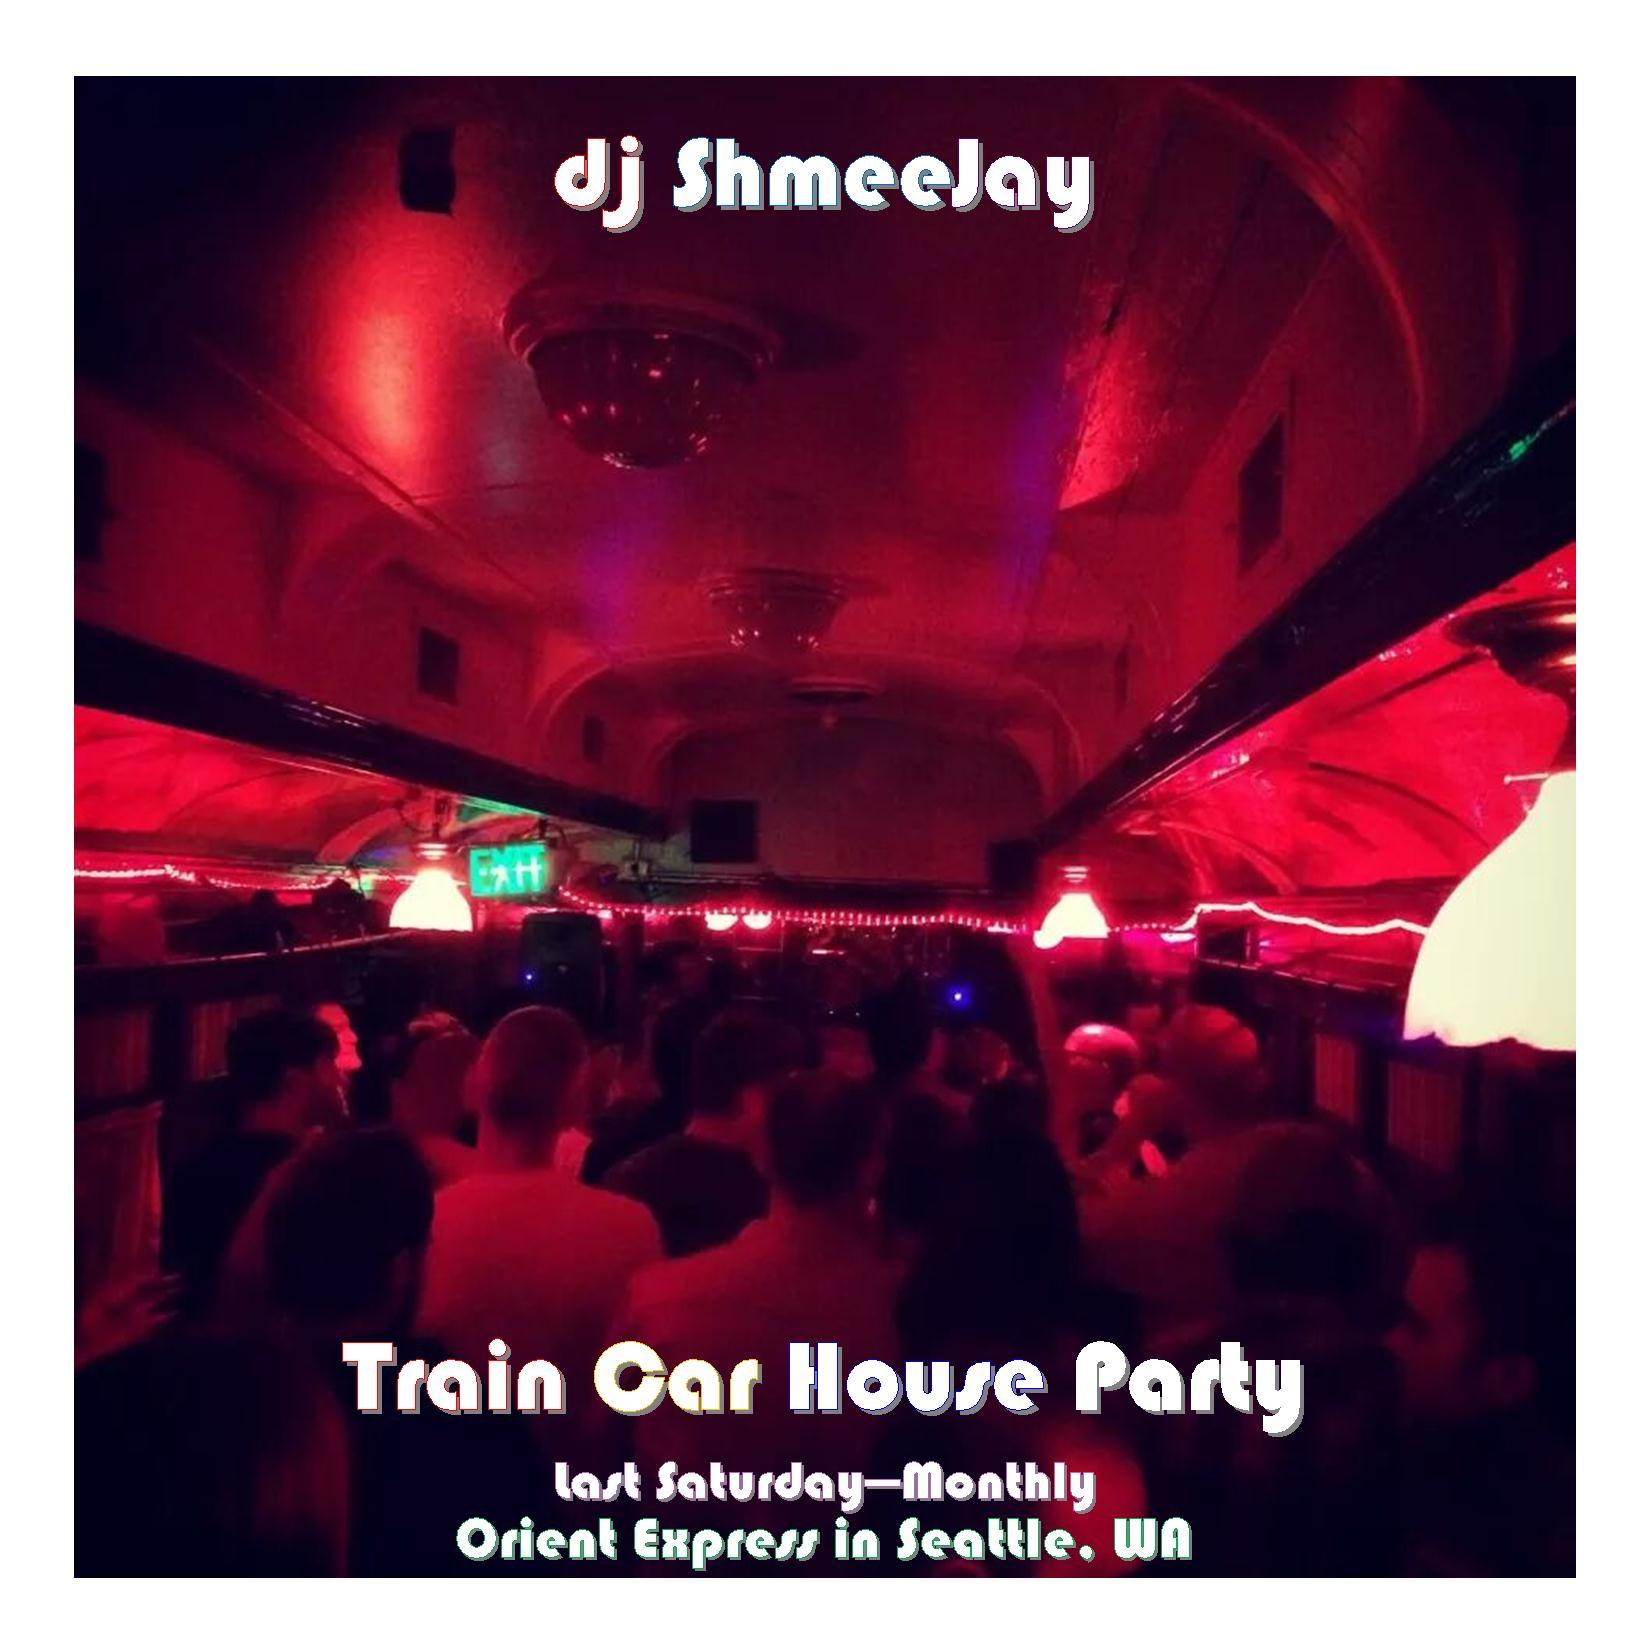 Train Car House Party